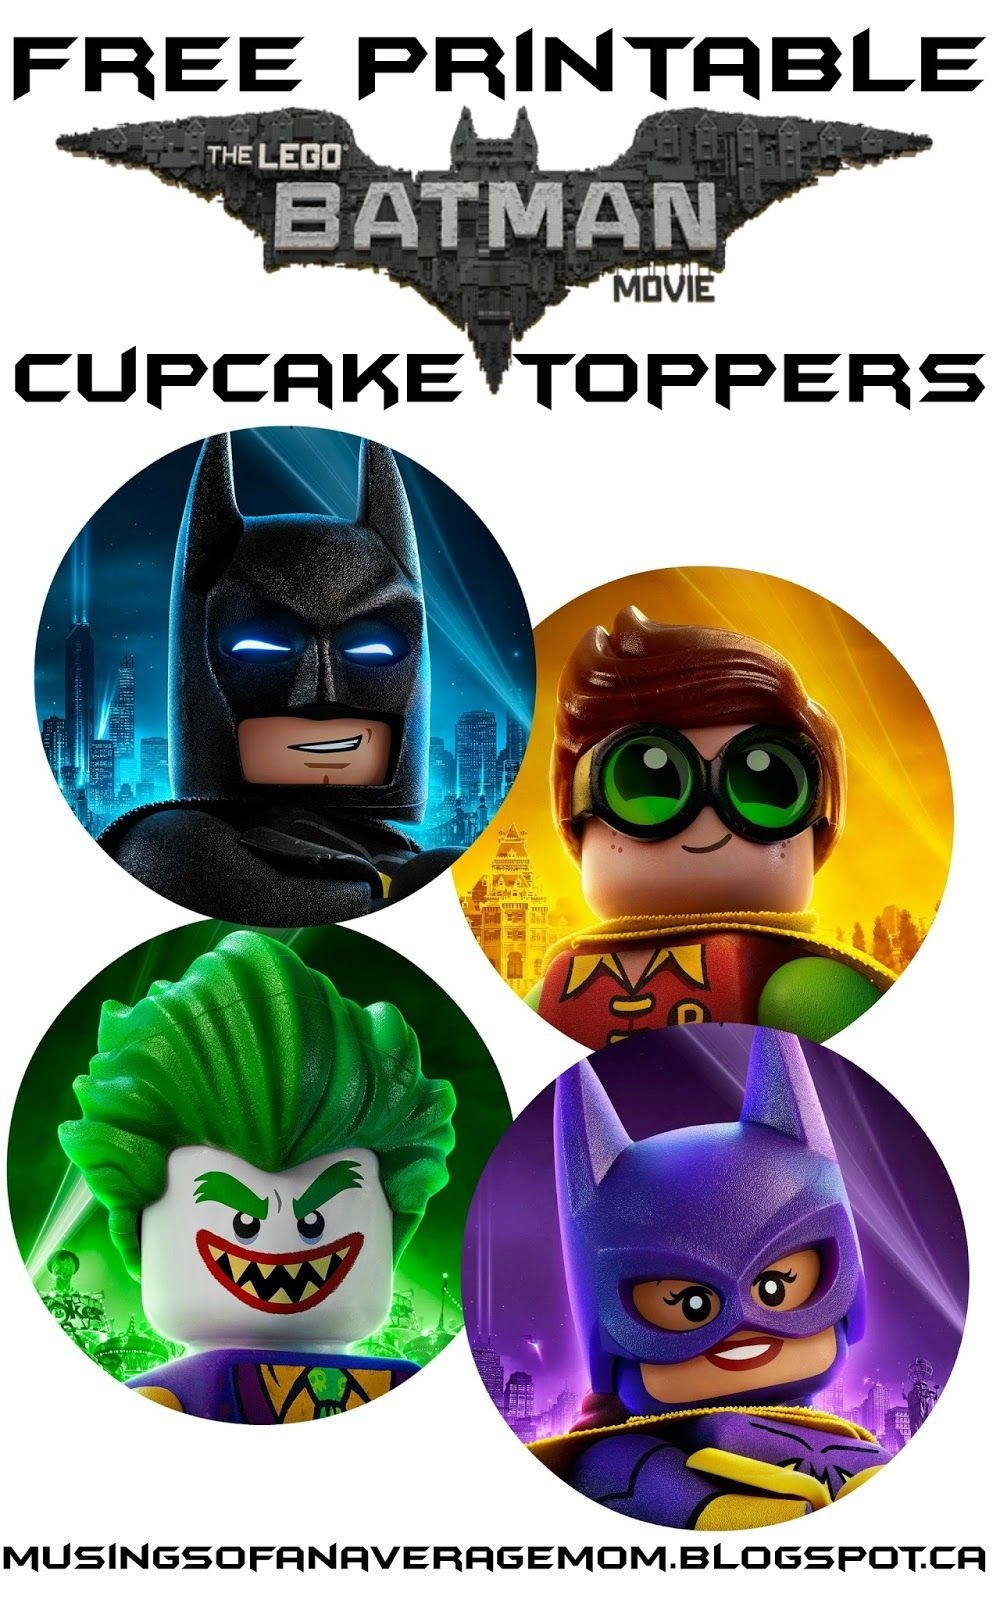 Free Lego Batman Cupcake Toppers   Daniel Bday Theme Ideas   Lego - Free Printable Lego Batman